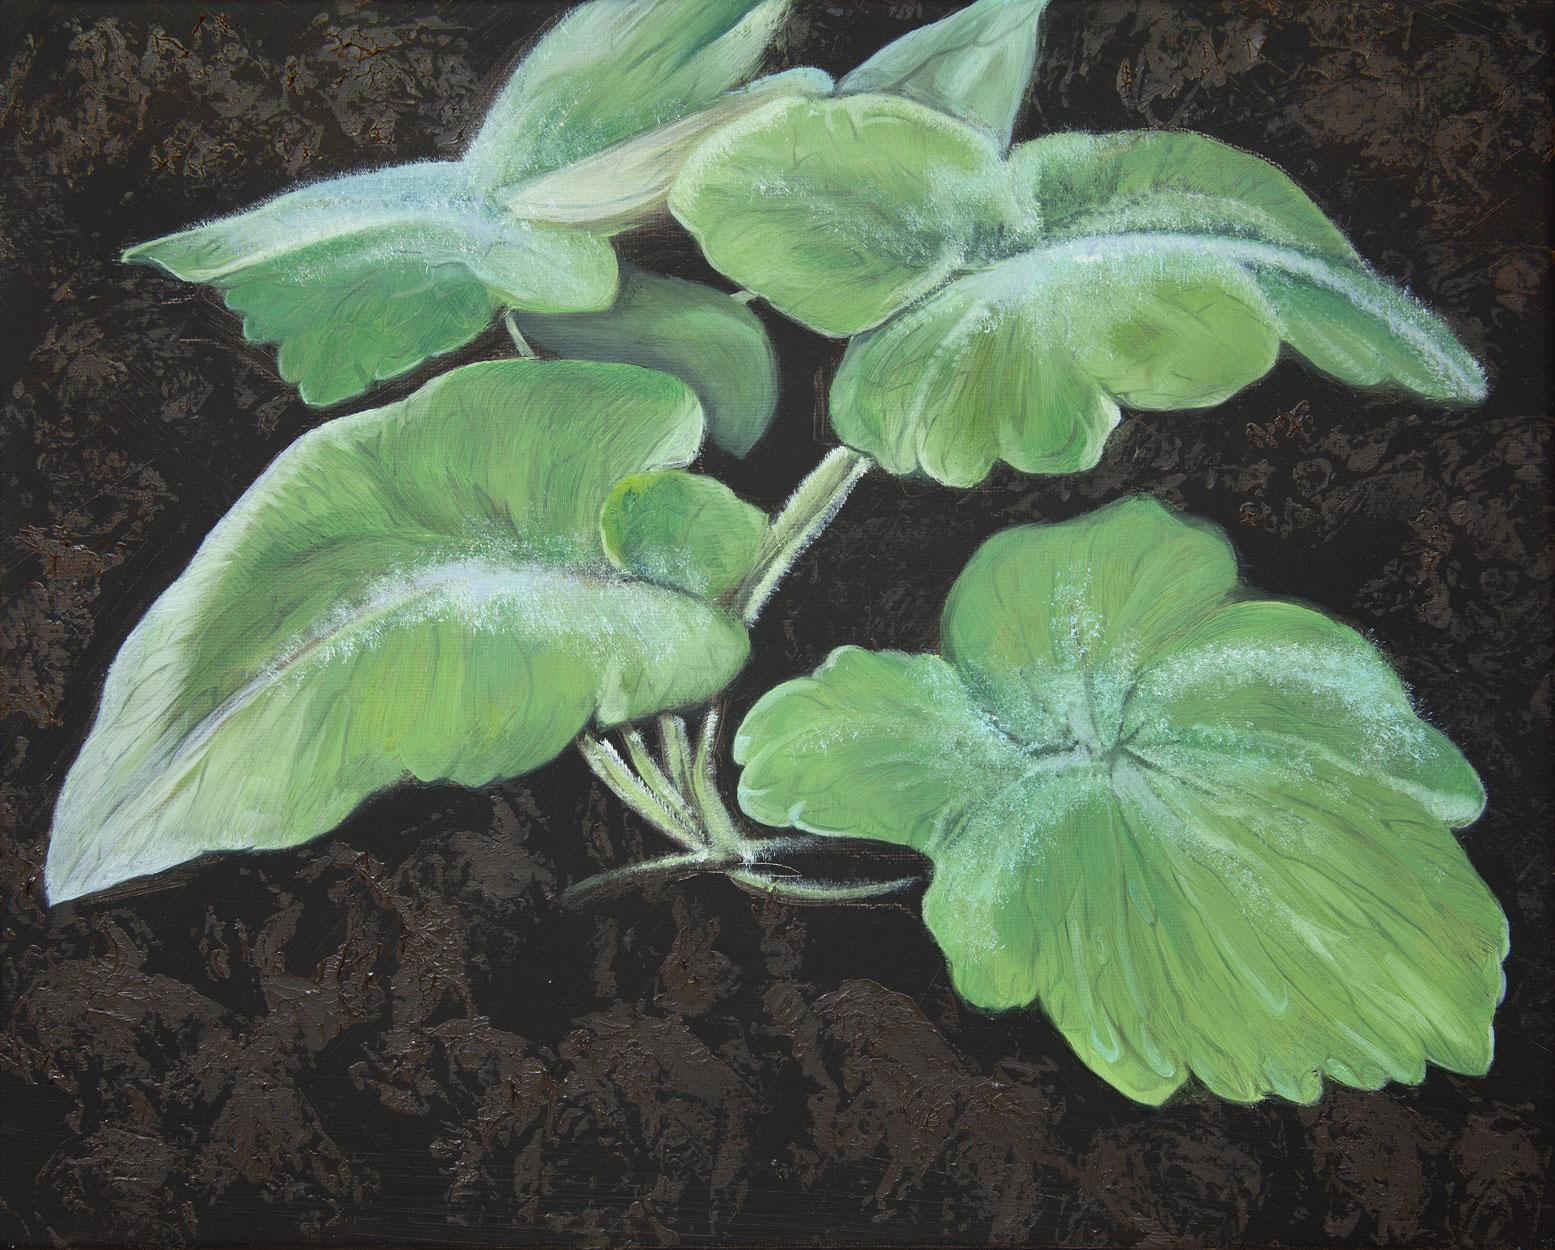 Bennie Reilly, Weed II, Botanic Gardens, Dublin, oil on canvas, 25x30cm